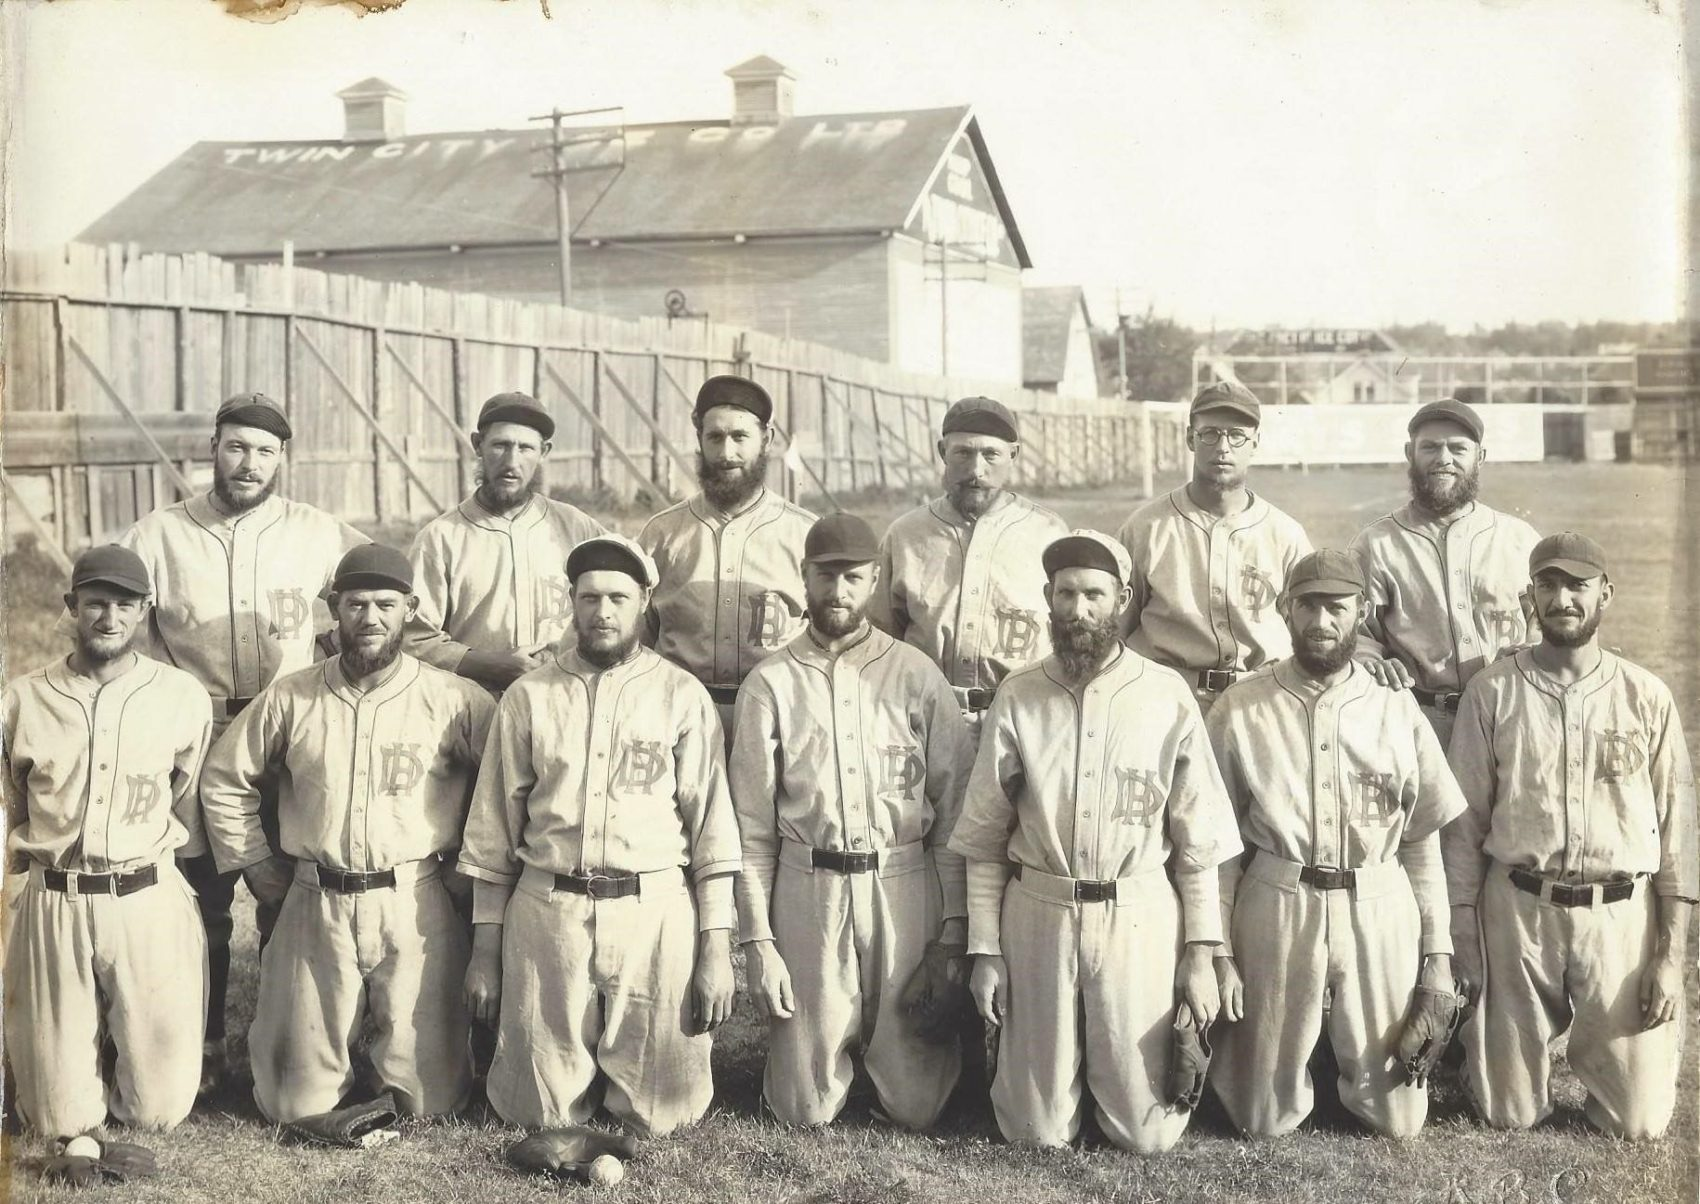 (Gracieuseté de la Maison de David Baseball Museum)